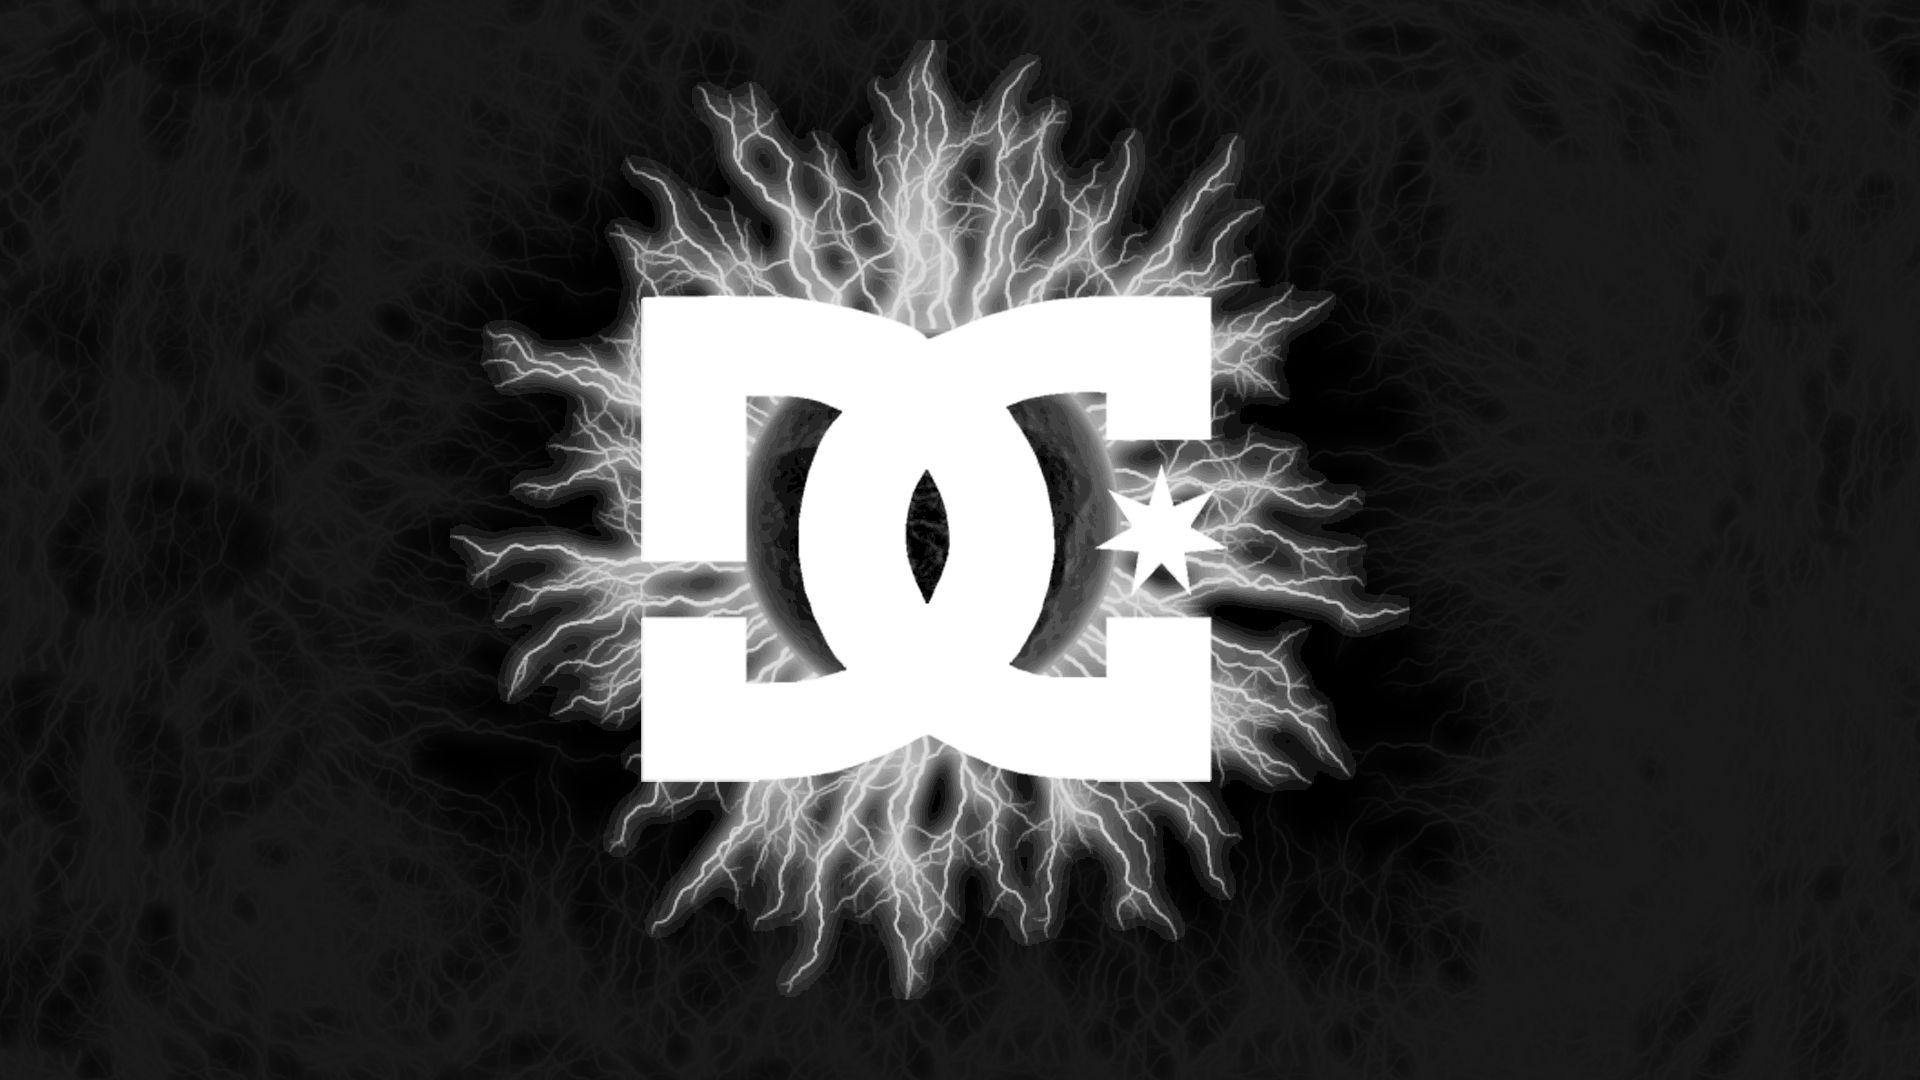 Download Quotes Wallpapers Desktop Hd Dc Shoes Logo Wallpapers Pixelstalk Net